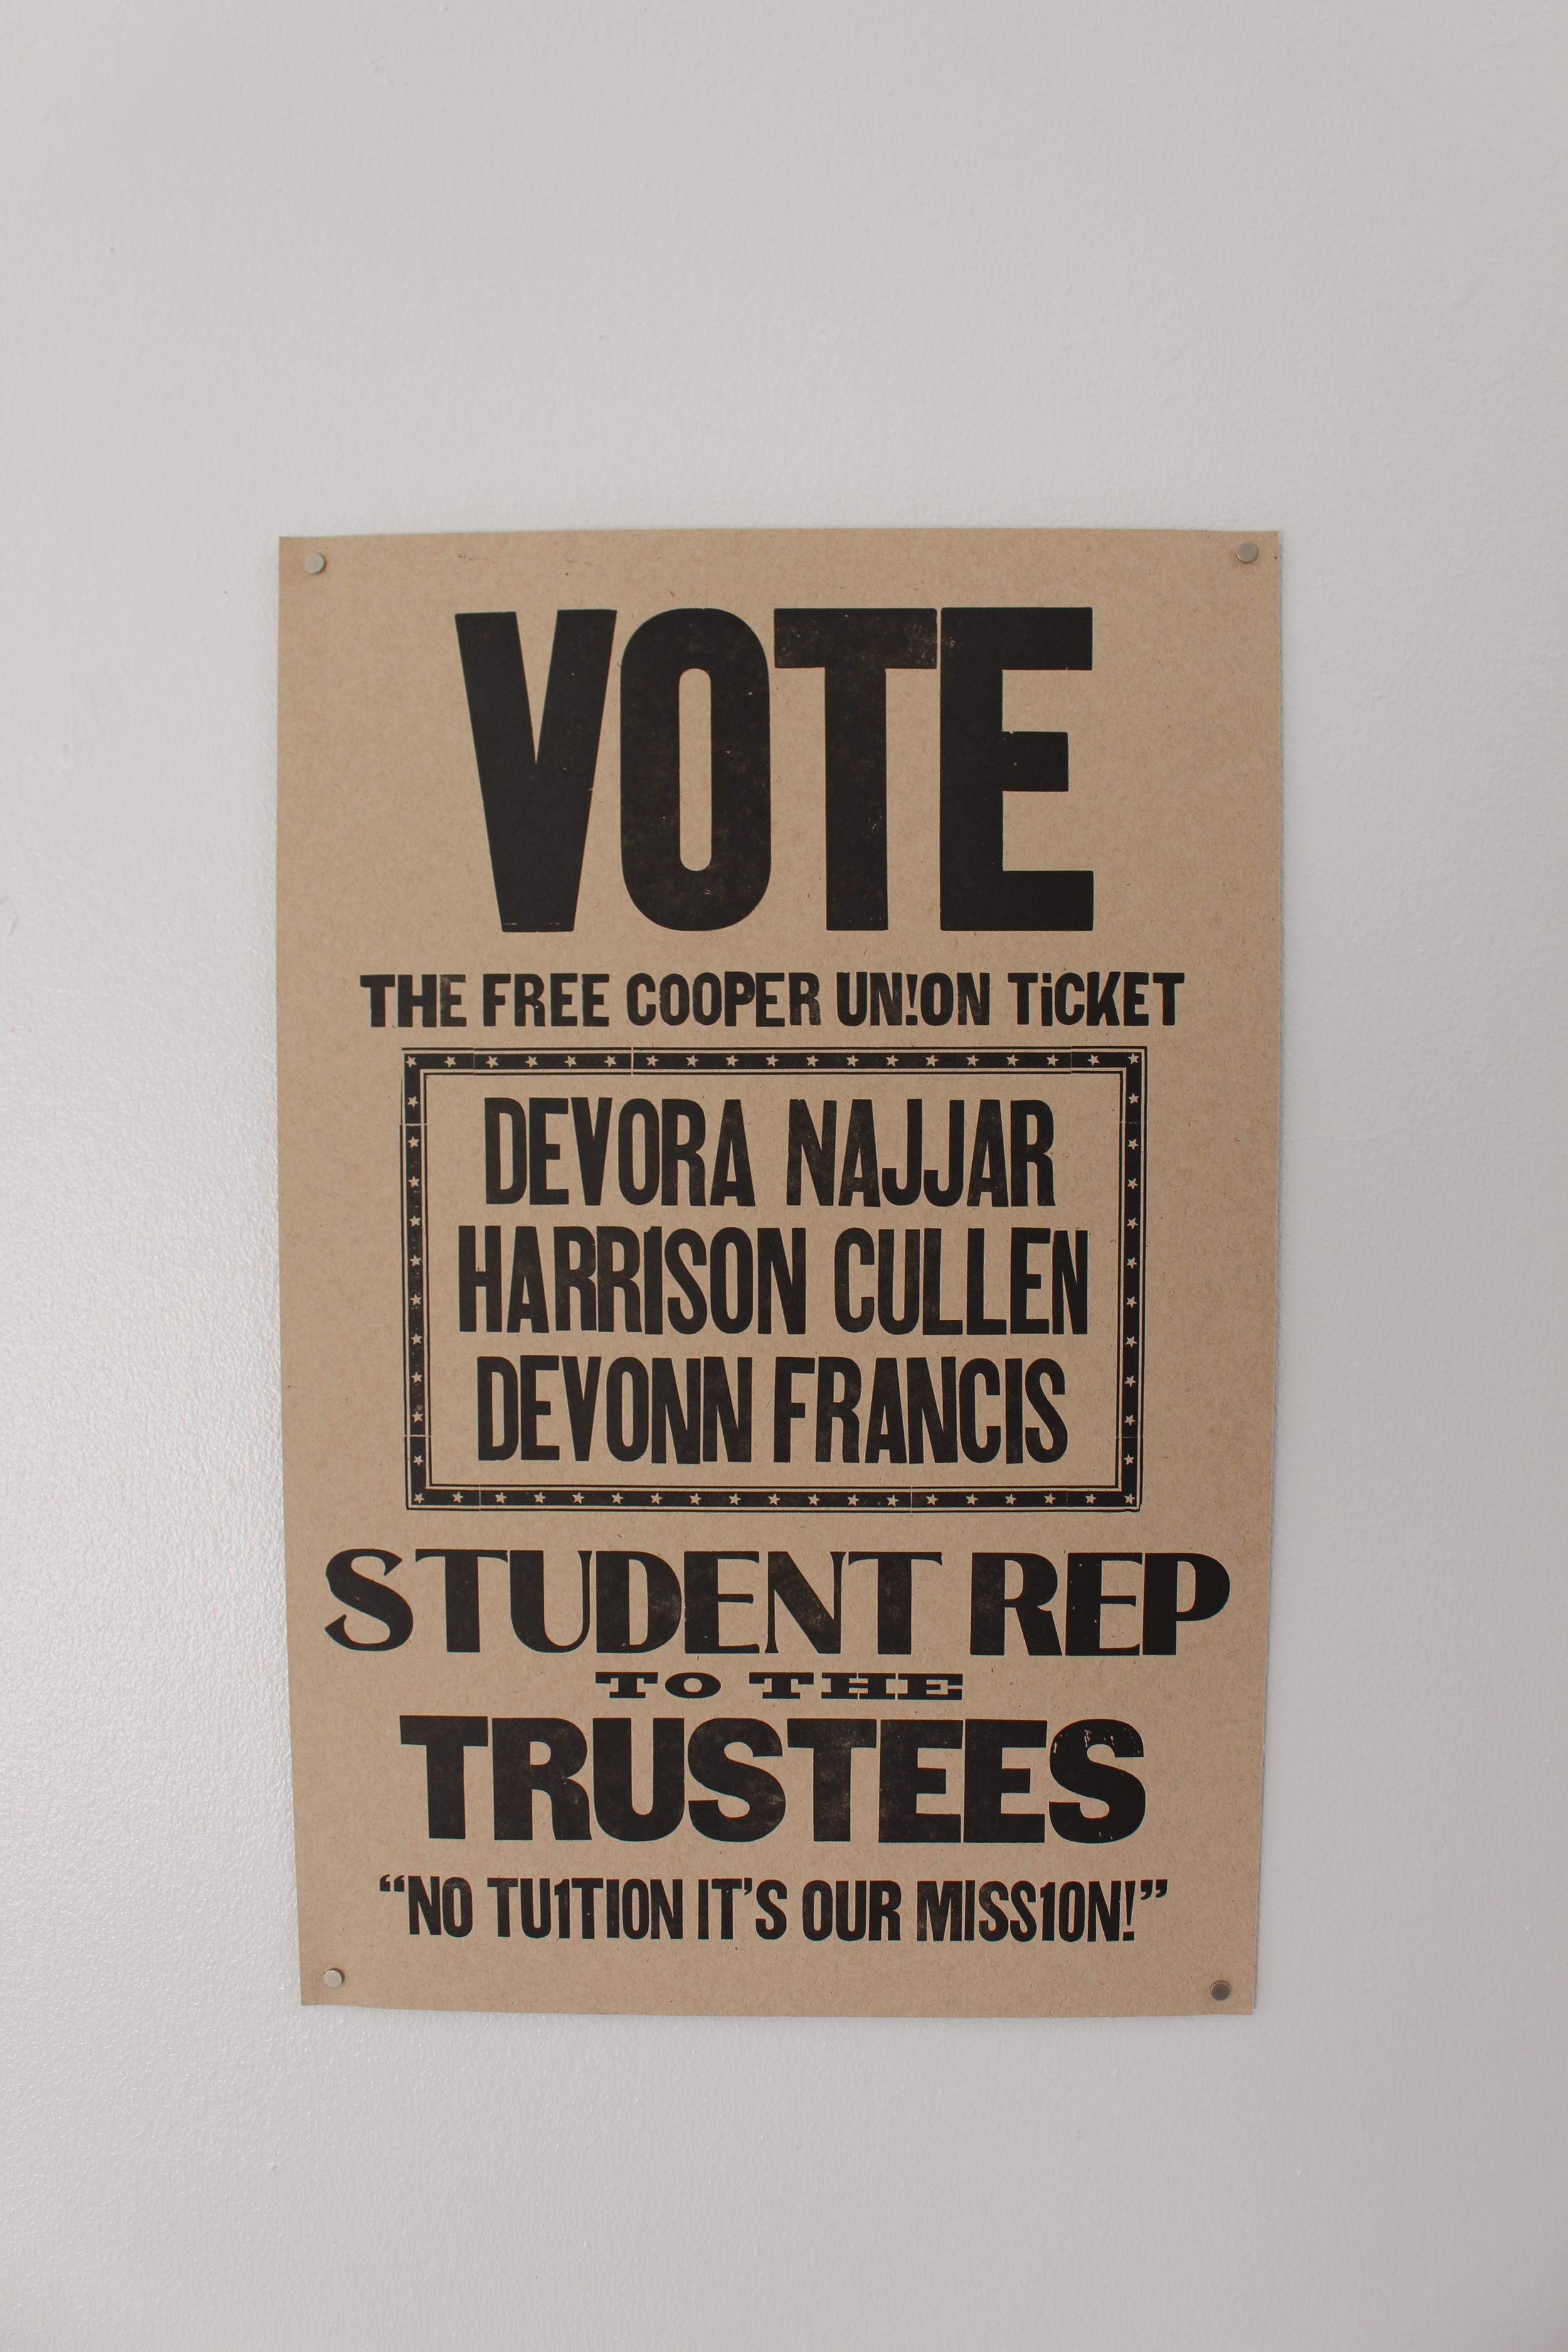 VOTE FREE COOPER